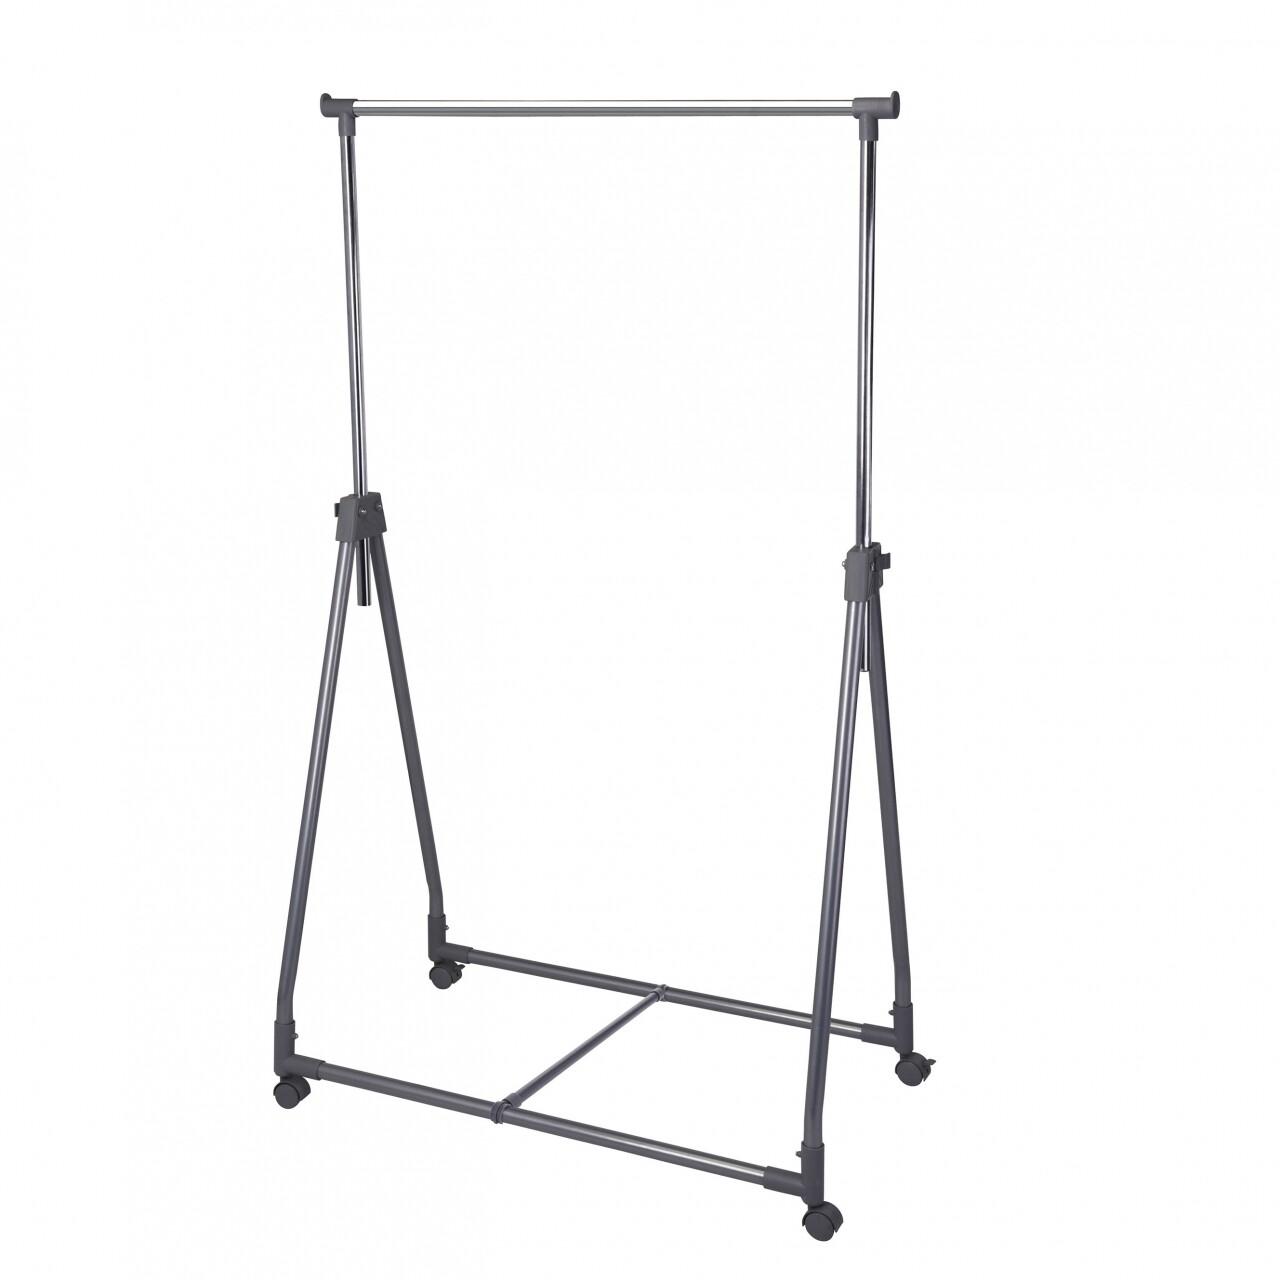 Suport pentru haine cu 4 roti, Clothing Rack, 91 x 22 x 93 cm, metal